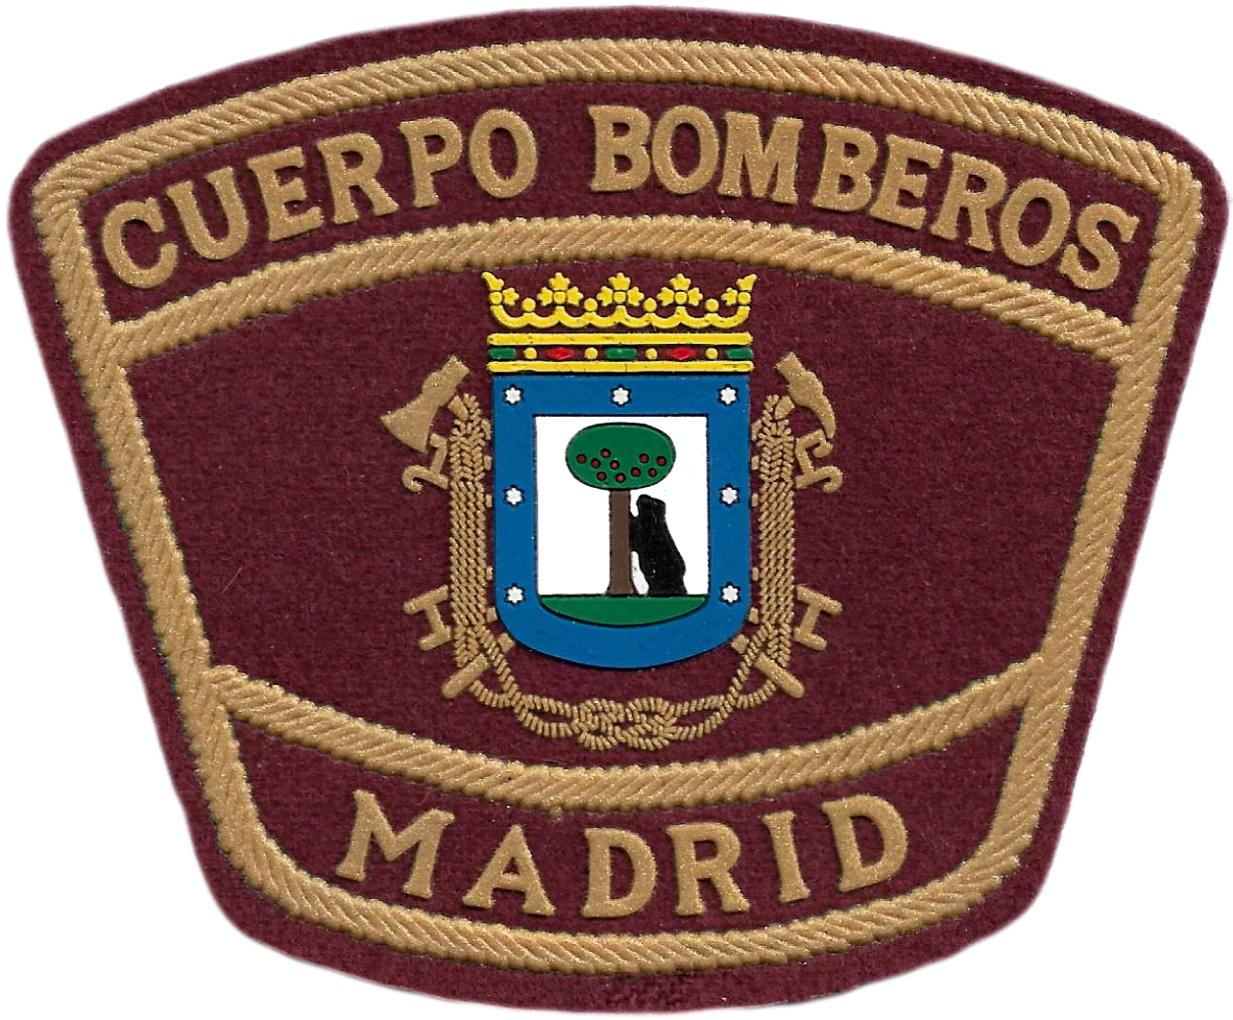 Bomberos de Madrid parche insignia emblema distintivo